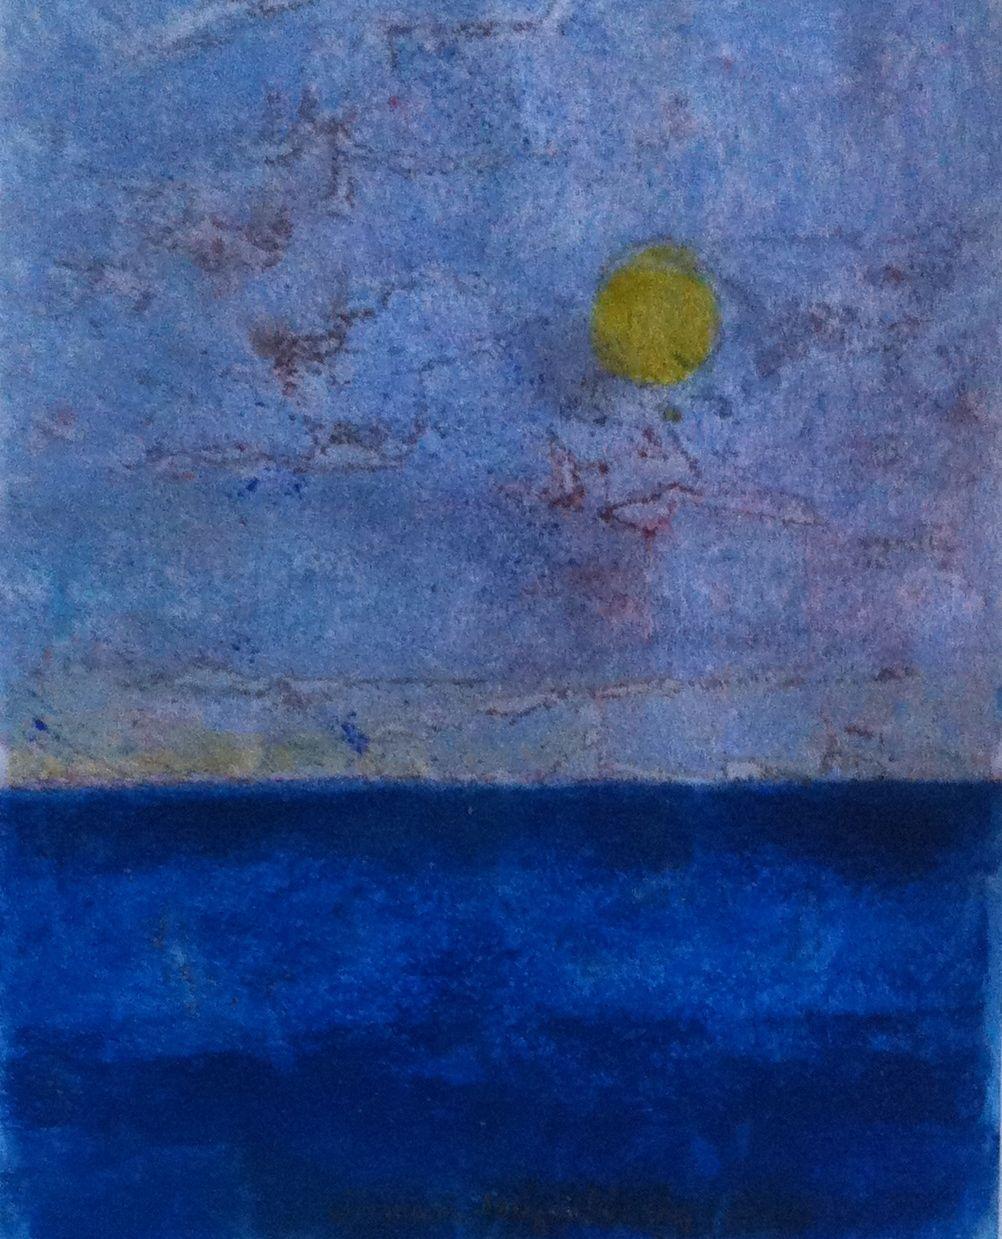 Sky and Sea 5